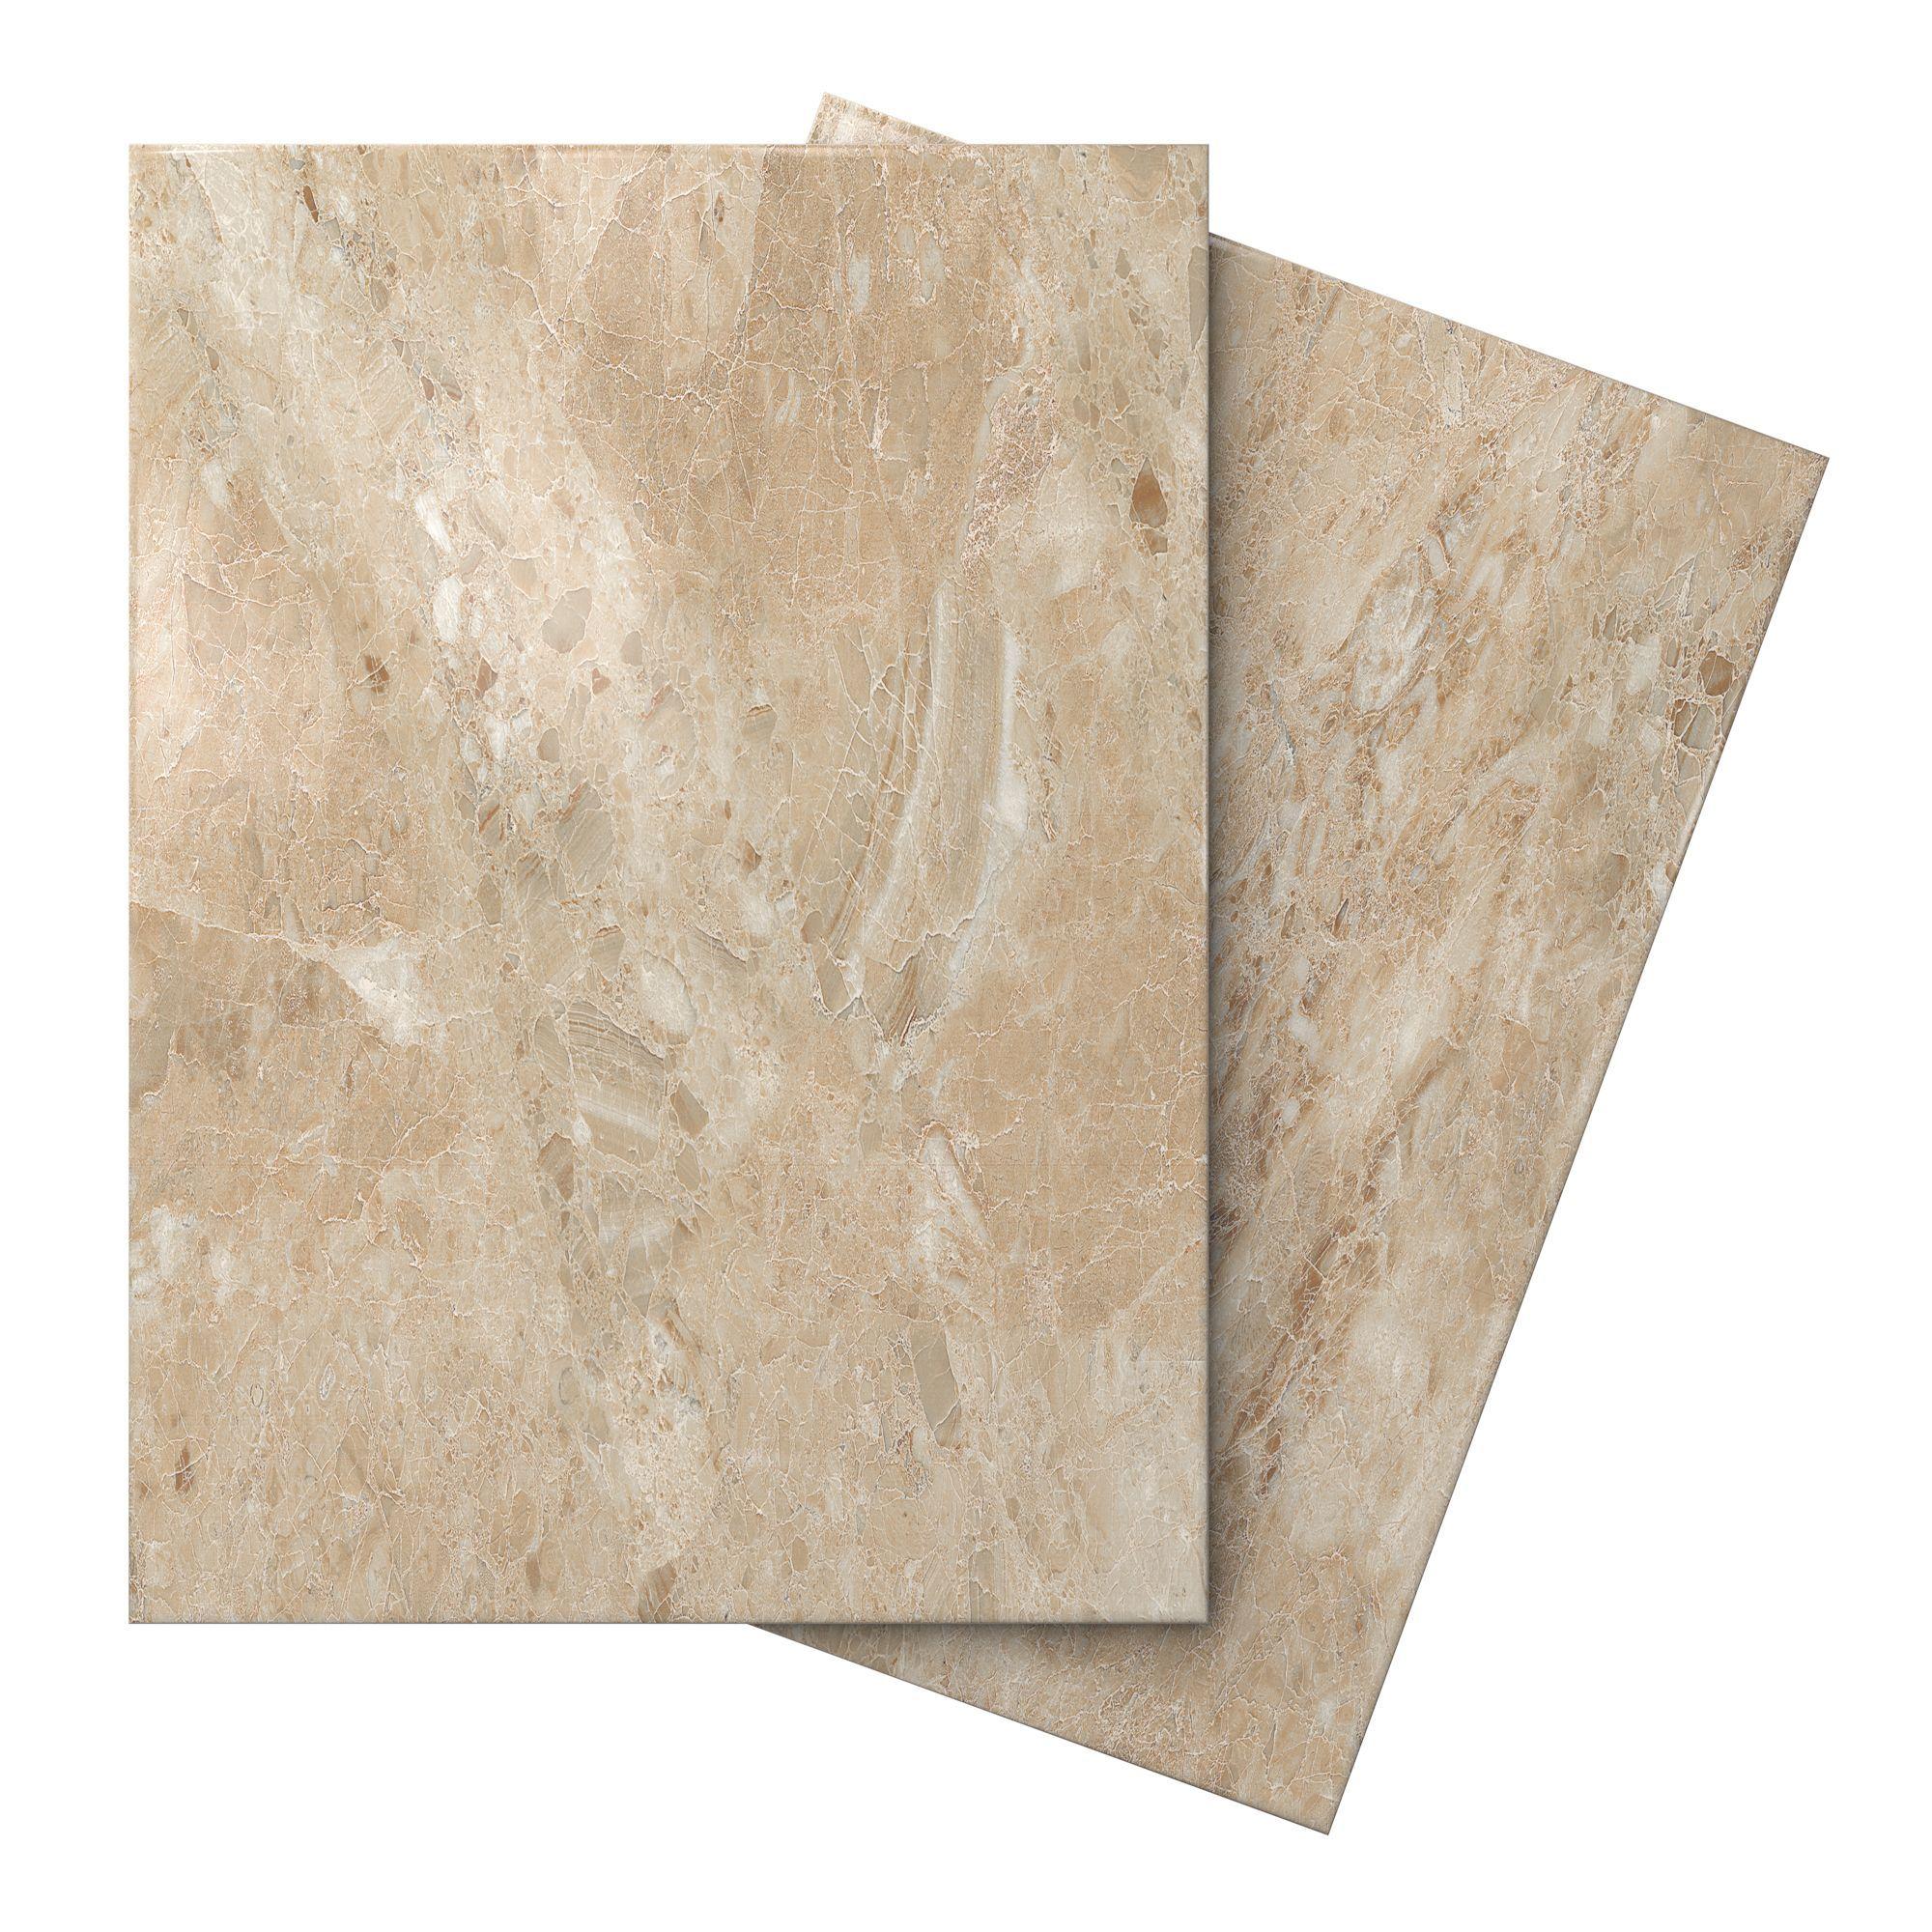 Illusion mocha marble effect ceramic wall floor tile pack of 10 illusion mocha marble effect ceramic wall floor tile pack of 10 l360mm w275mm dailygadgetfo Gallery